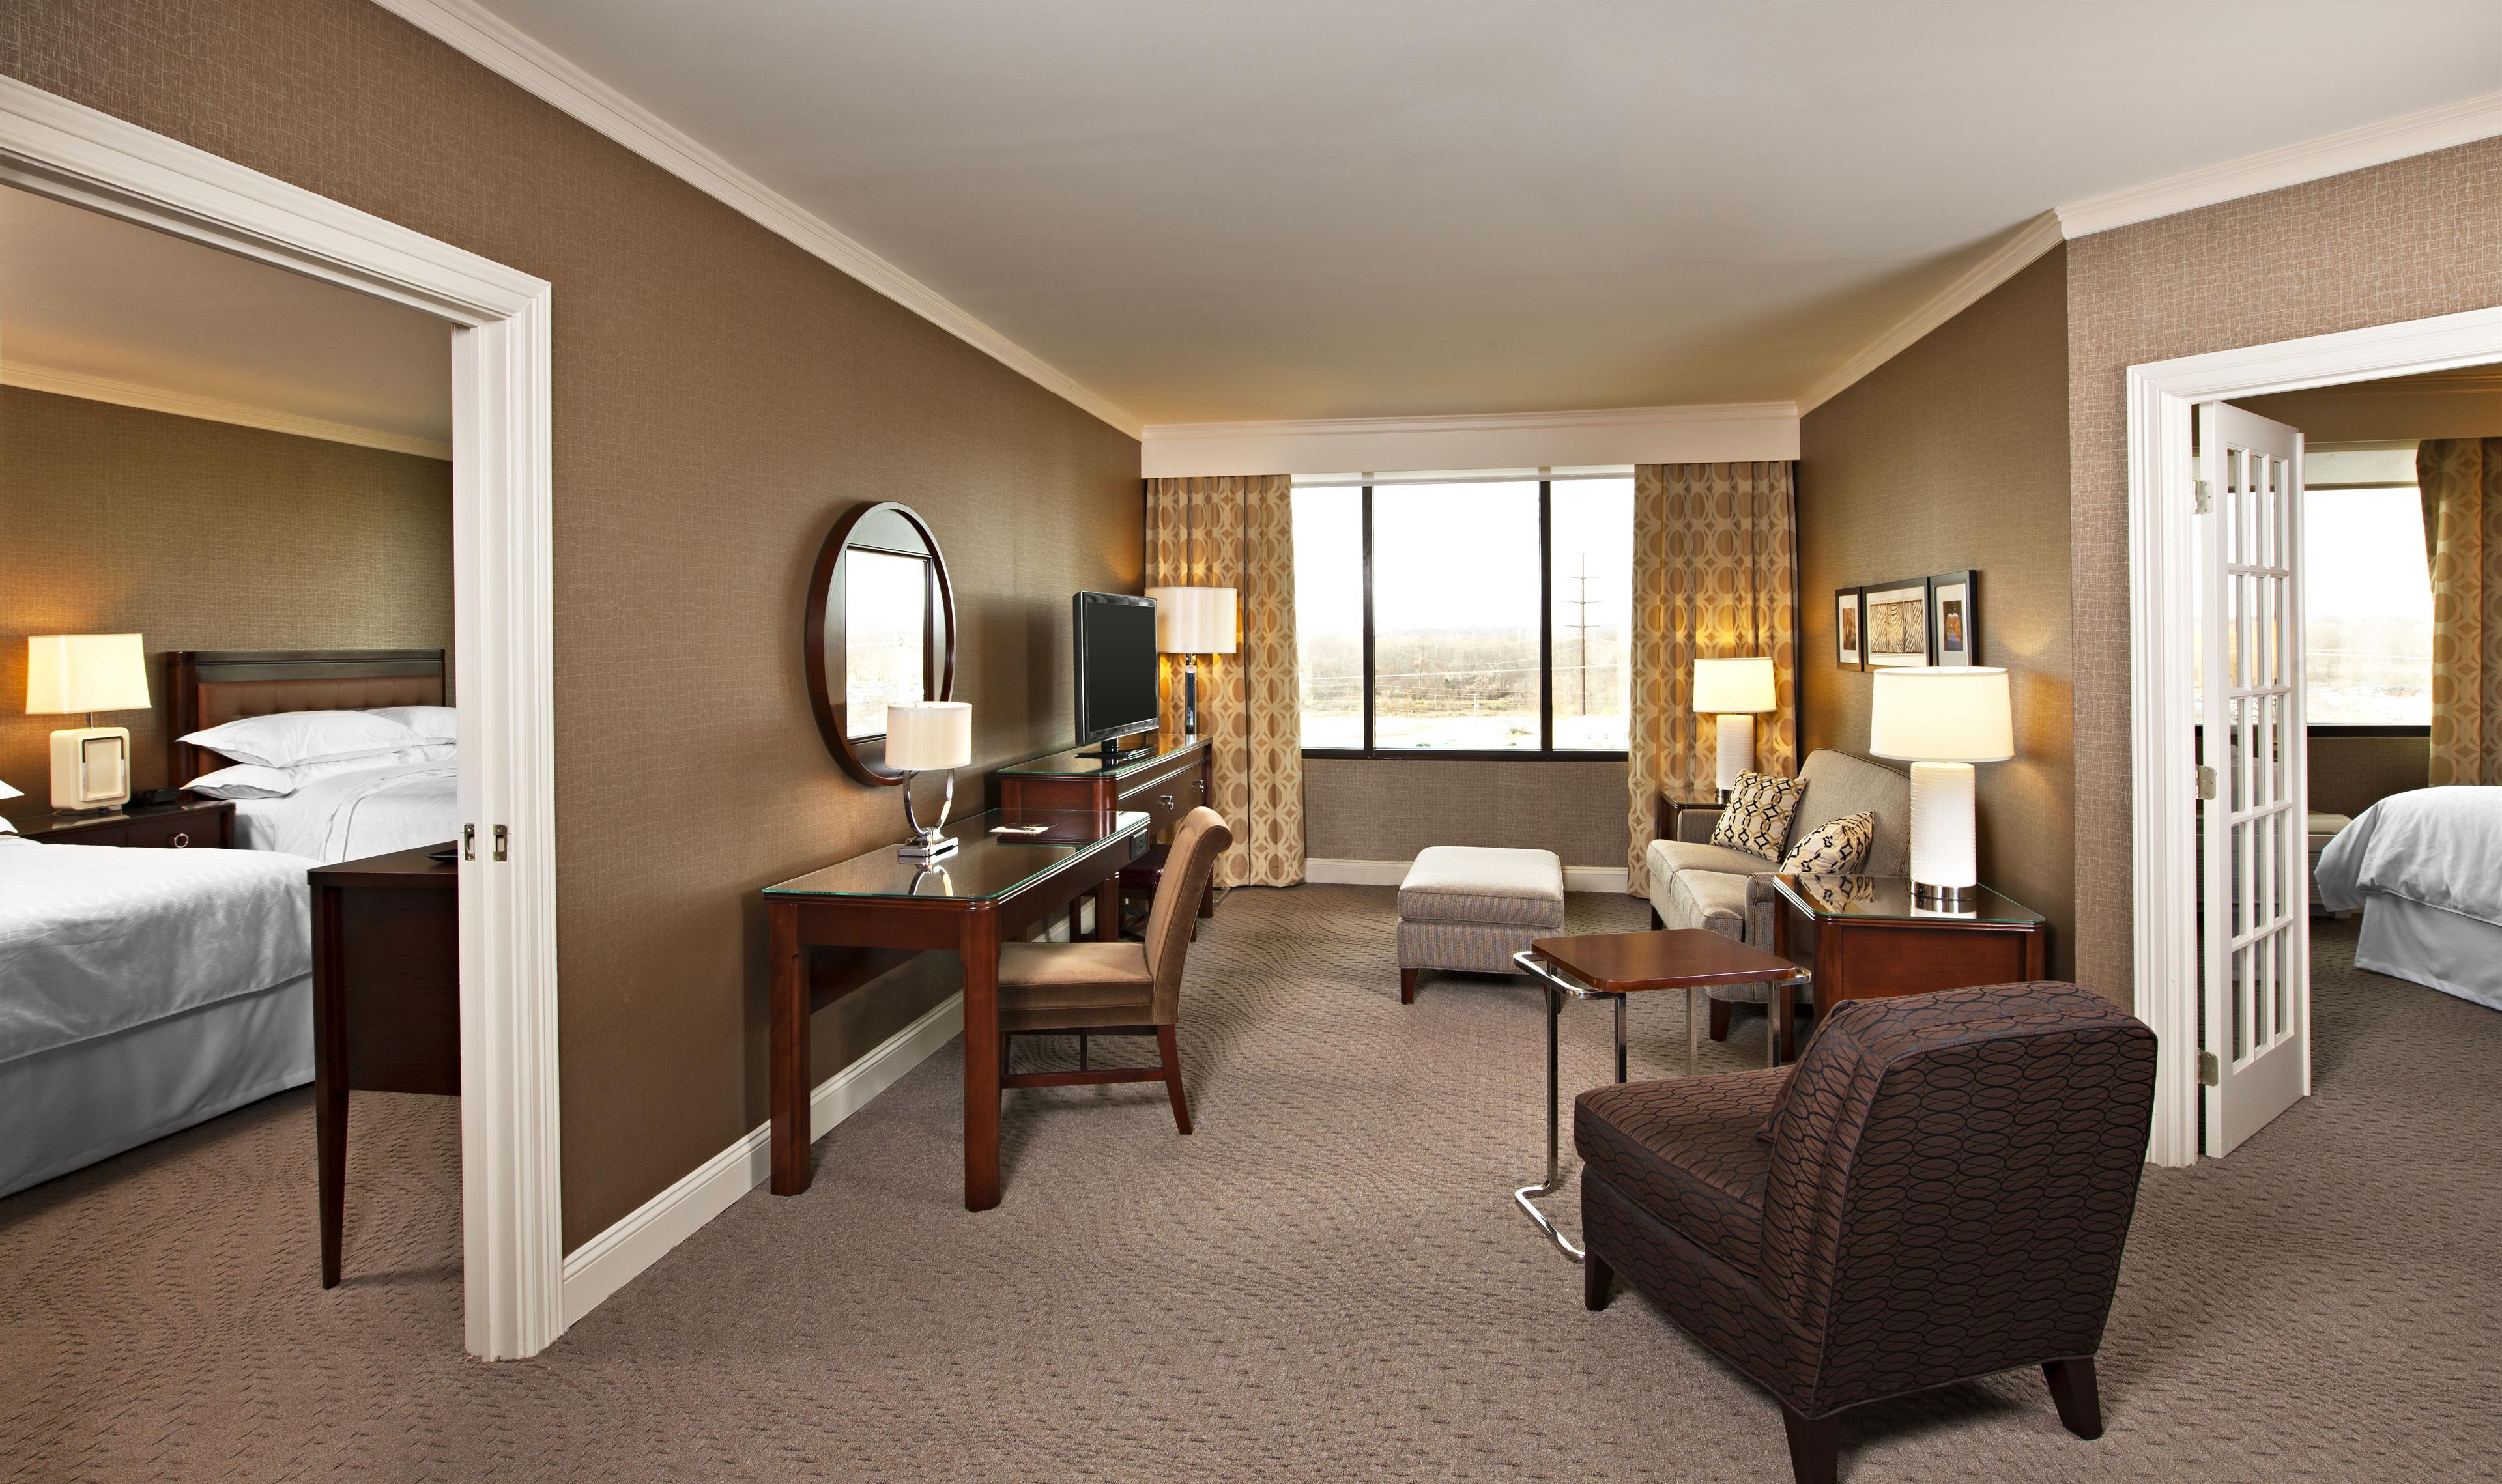 Sheraton Wilmington South Hotel image 5